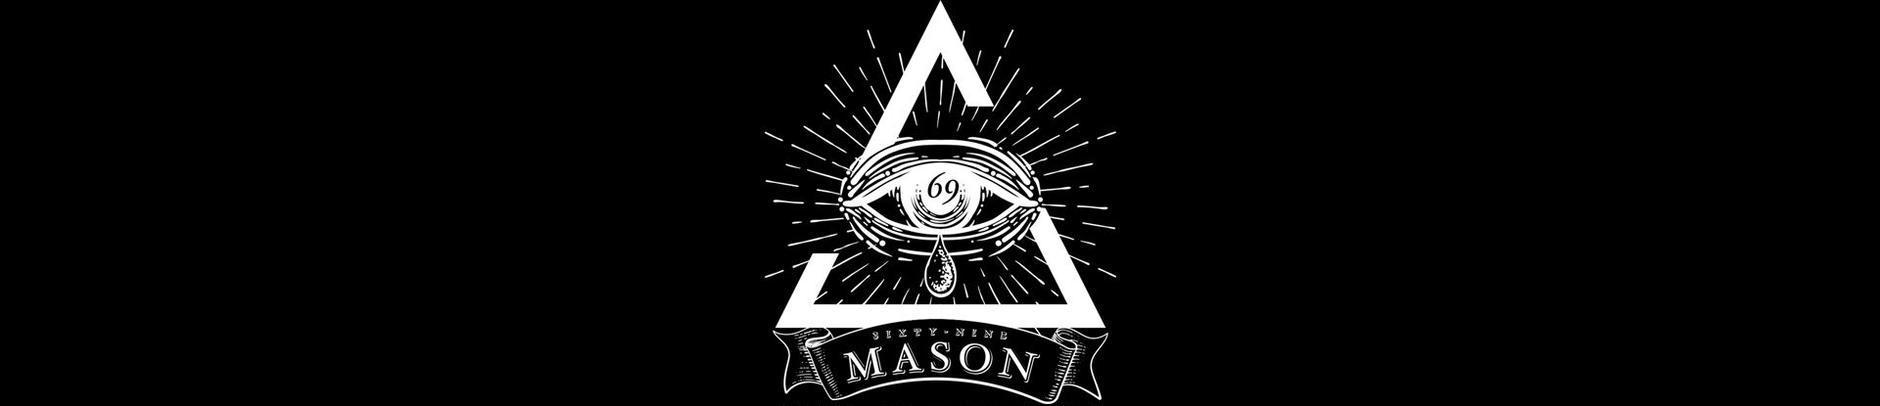 69mason